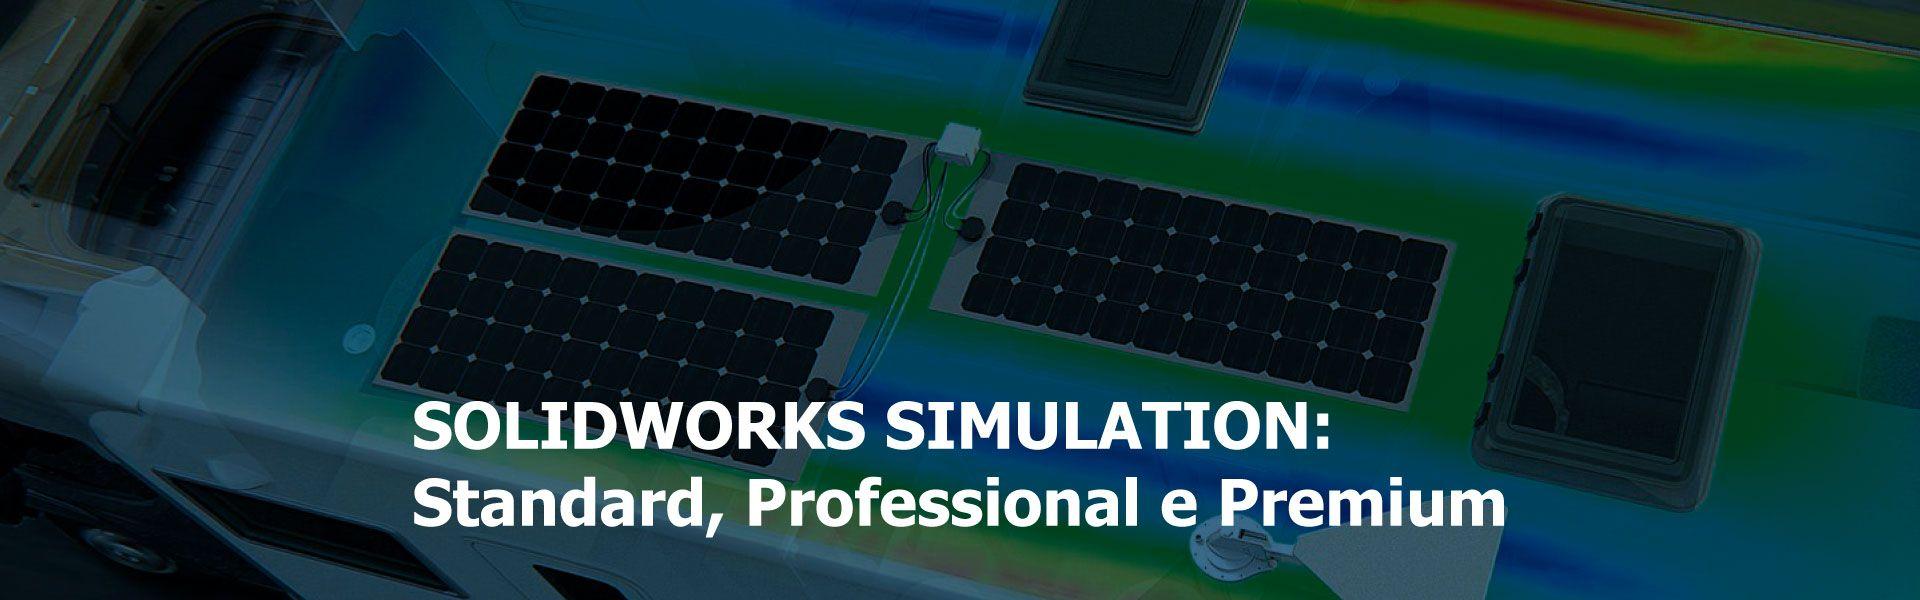 SolidWorks Simulatio: Standard, Professional e Premium